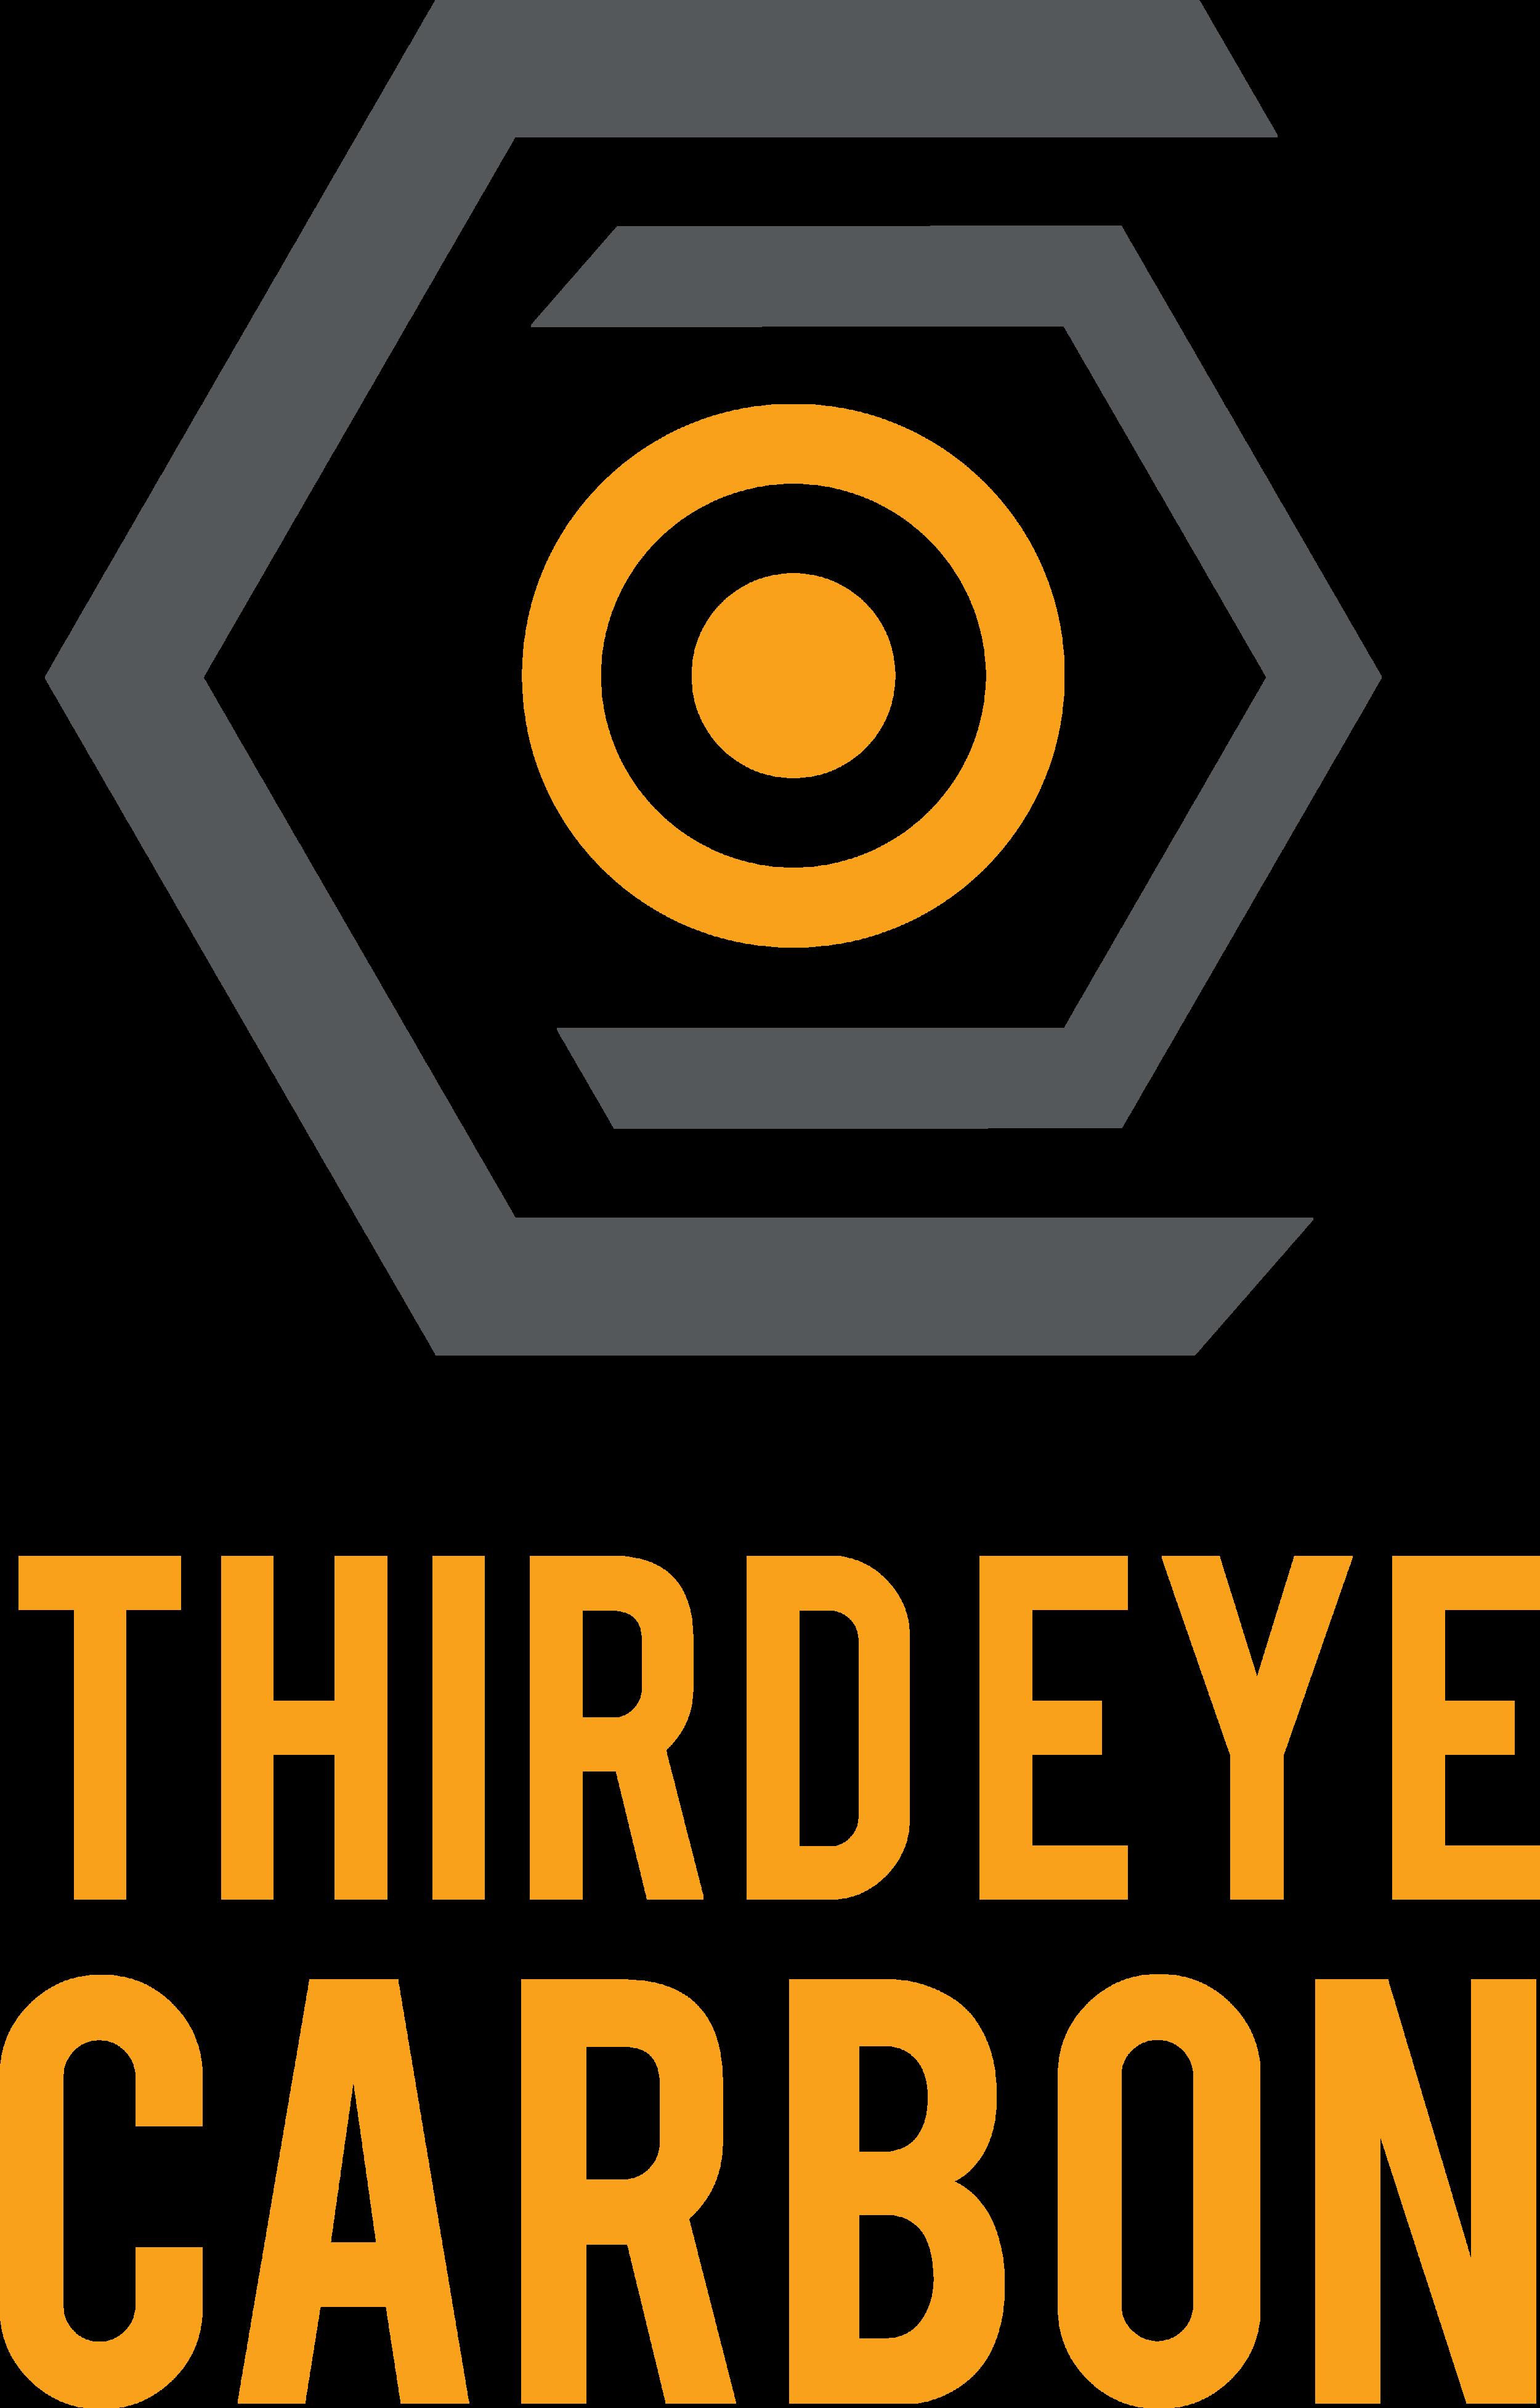 3rdeyecarbon_logo_VERTICAL_Pantones.png